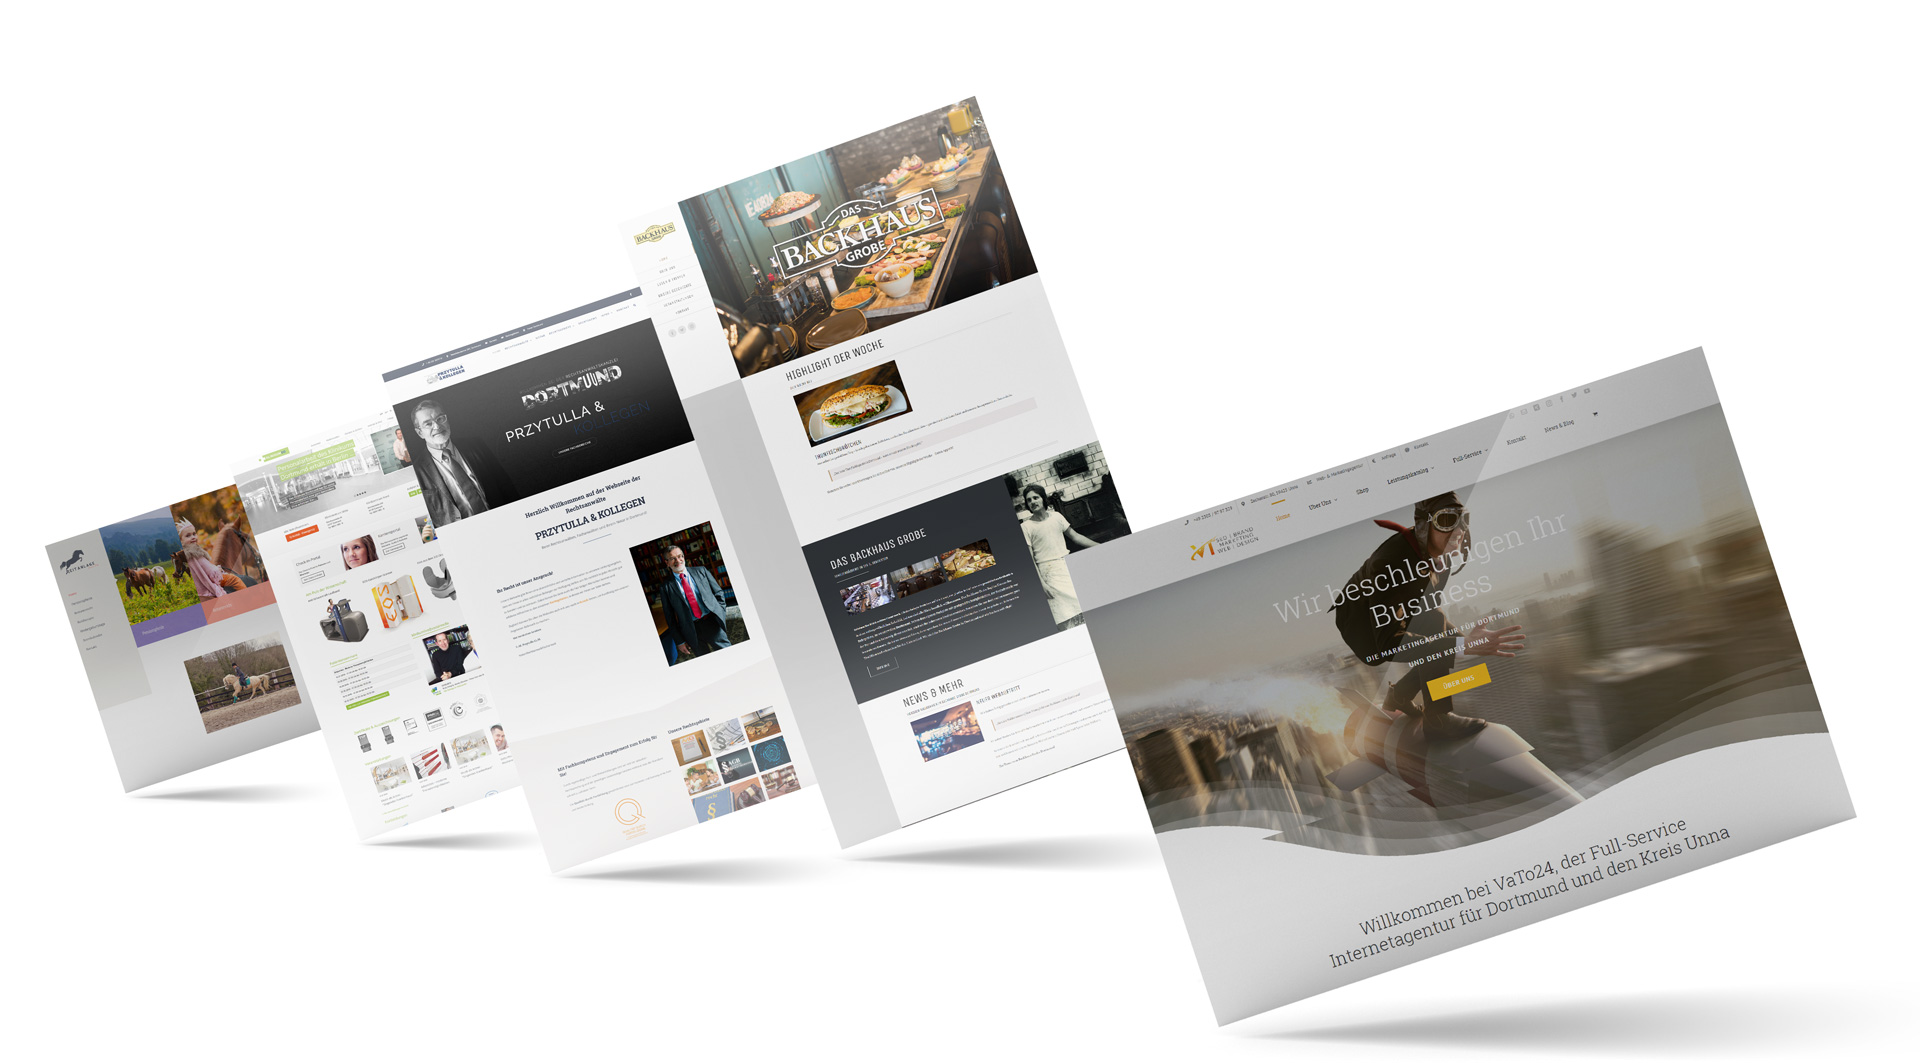 Marketingagentur Unna | VaTo24